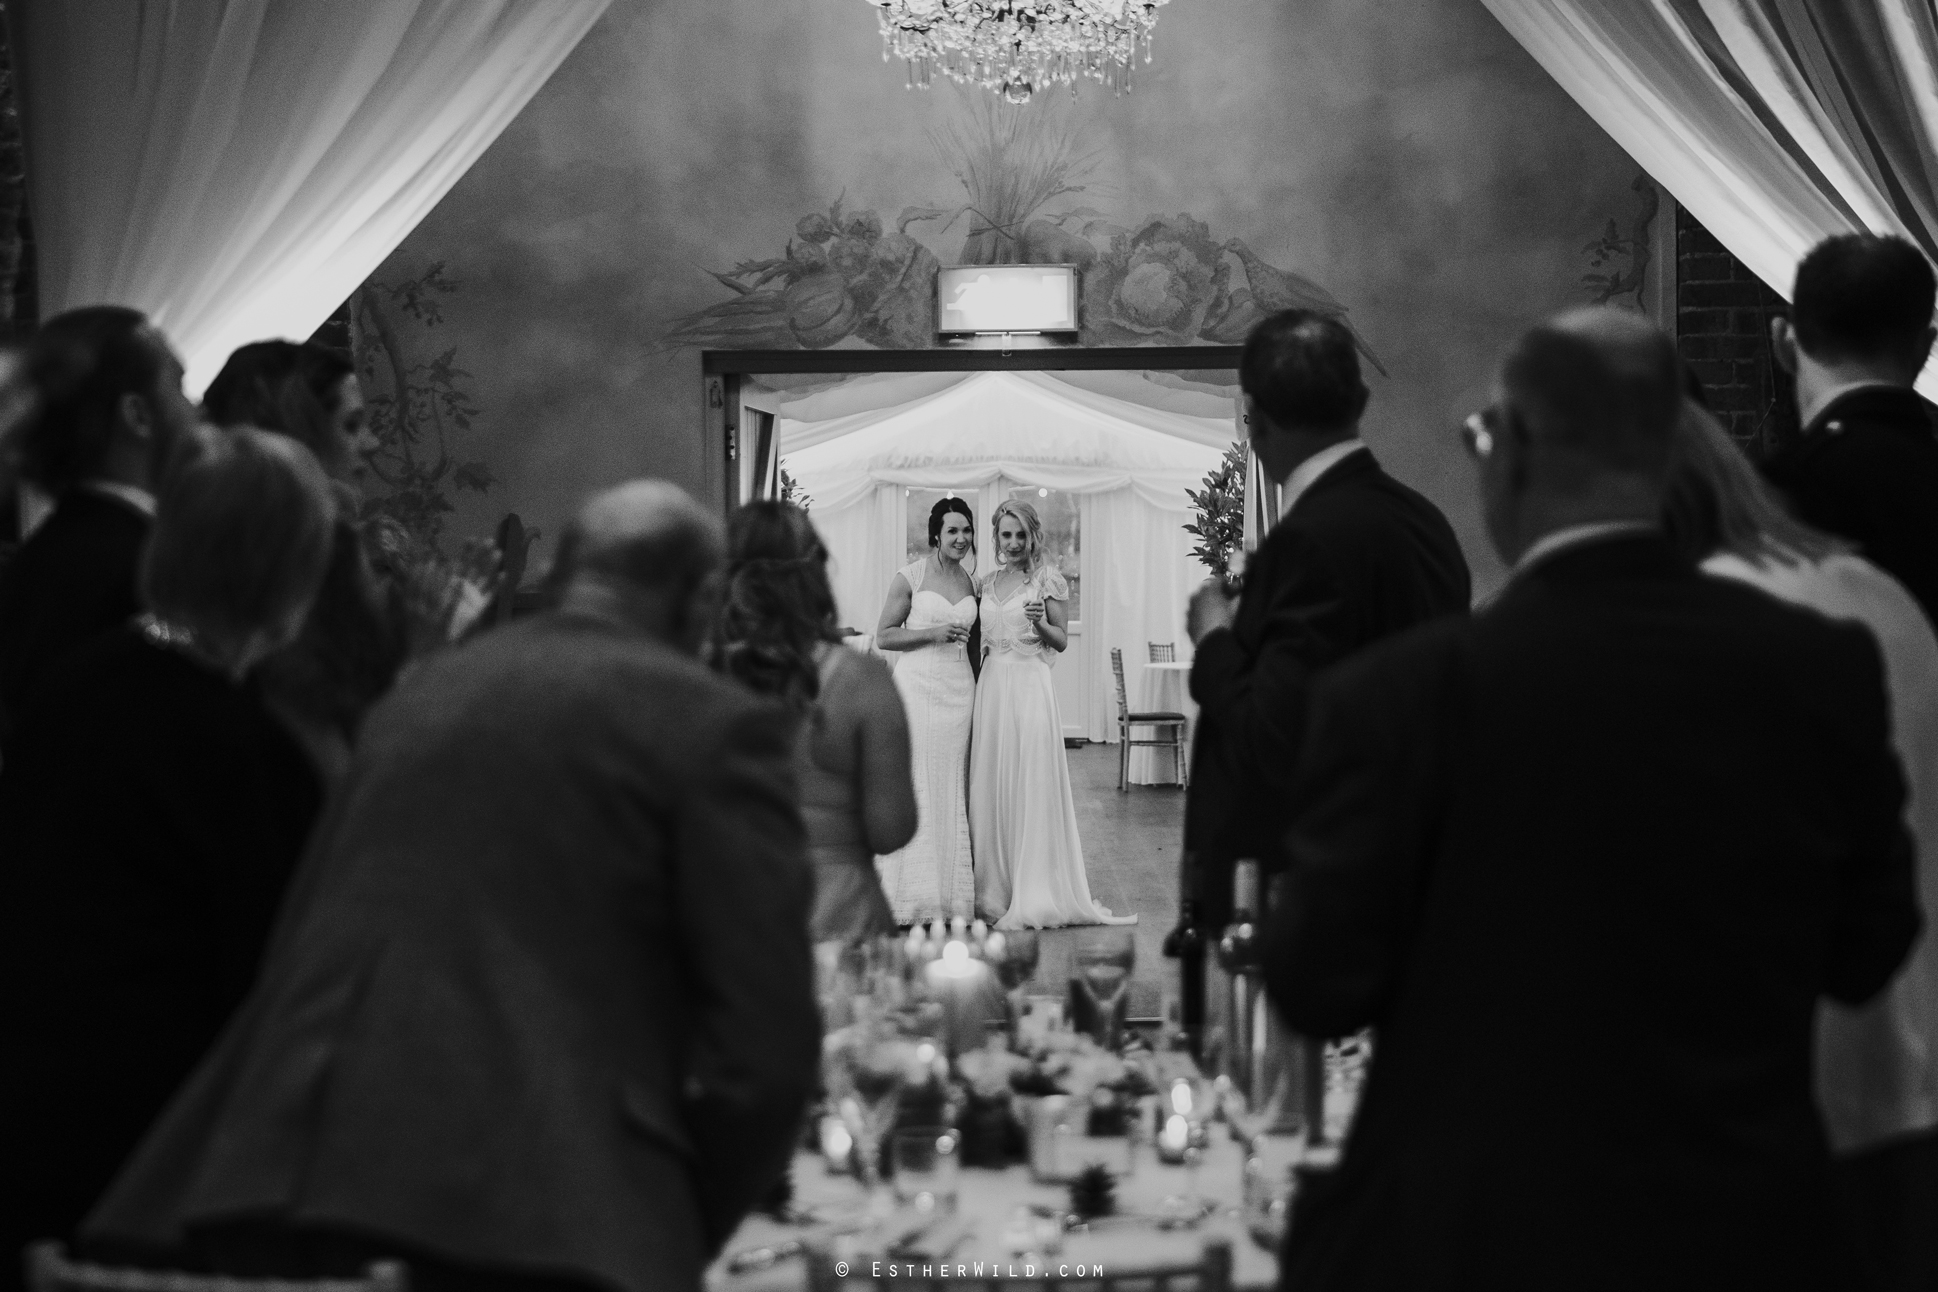 Elms_Barn_Weddings_Suffolk_Photographer_Copyright_Esther_Wild_IMG_2301.jpg